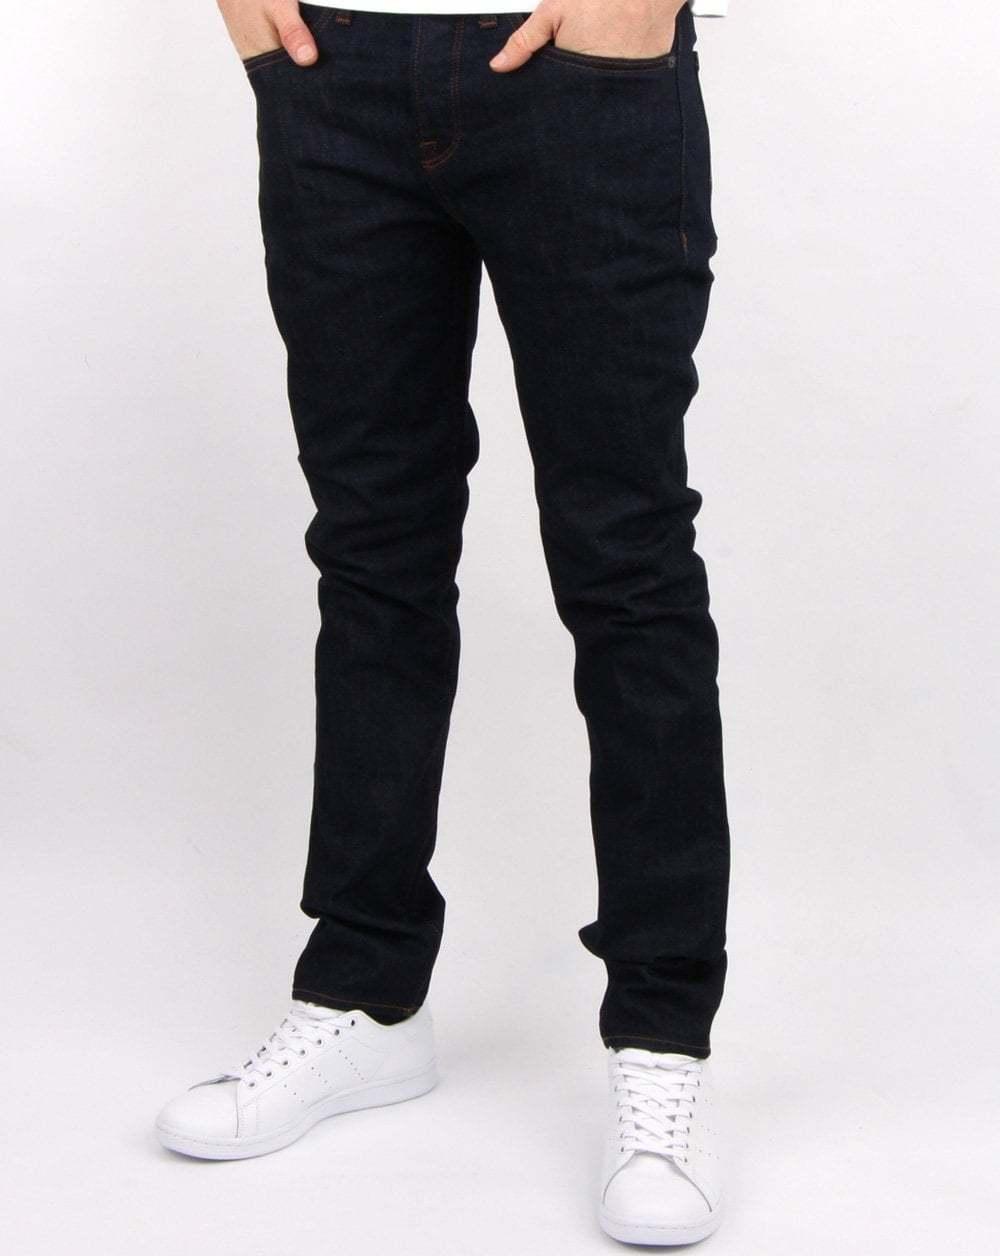 Pretty Pretty Pretty verde Da Uomo erwood Jeans Slim Fit in 6 mese Wash (blu scuro indaco) 033d2c